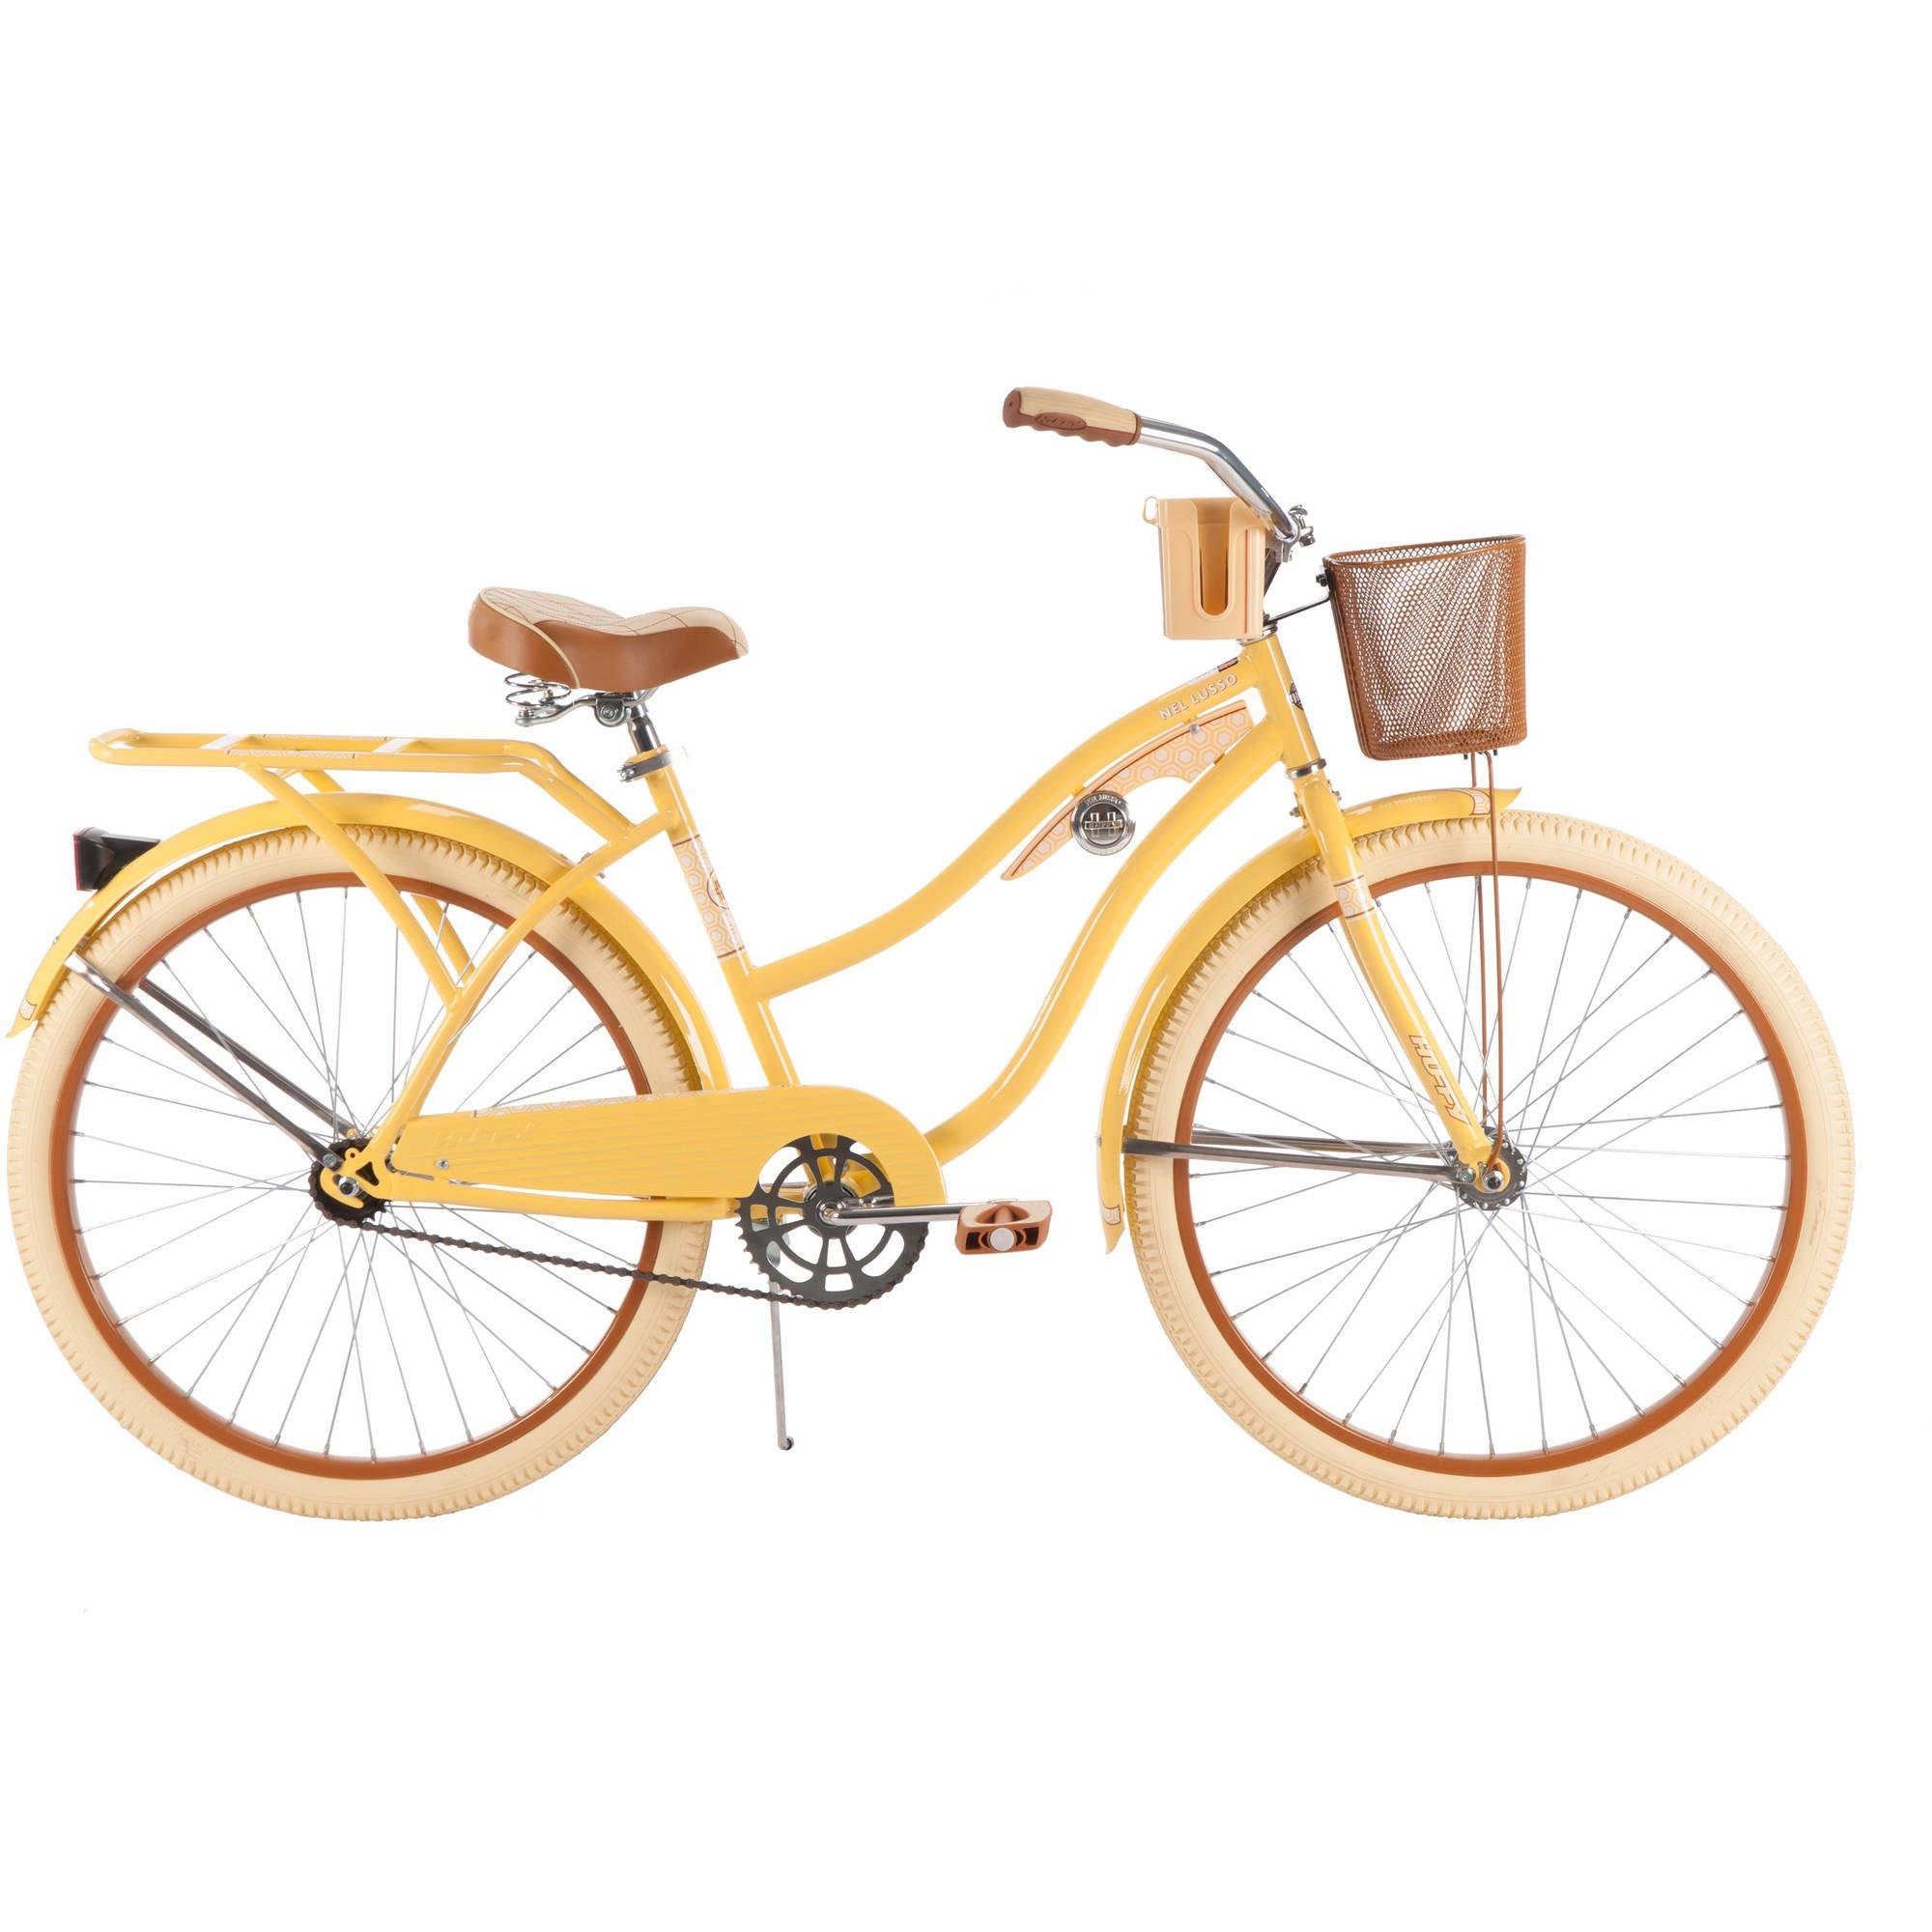 26'' Huffy Nel Lusso Women's Cruiser Bike, Yellow by Huffy (Image #1)